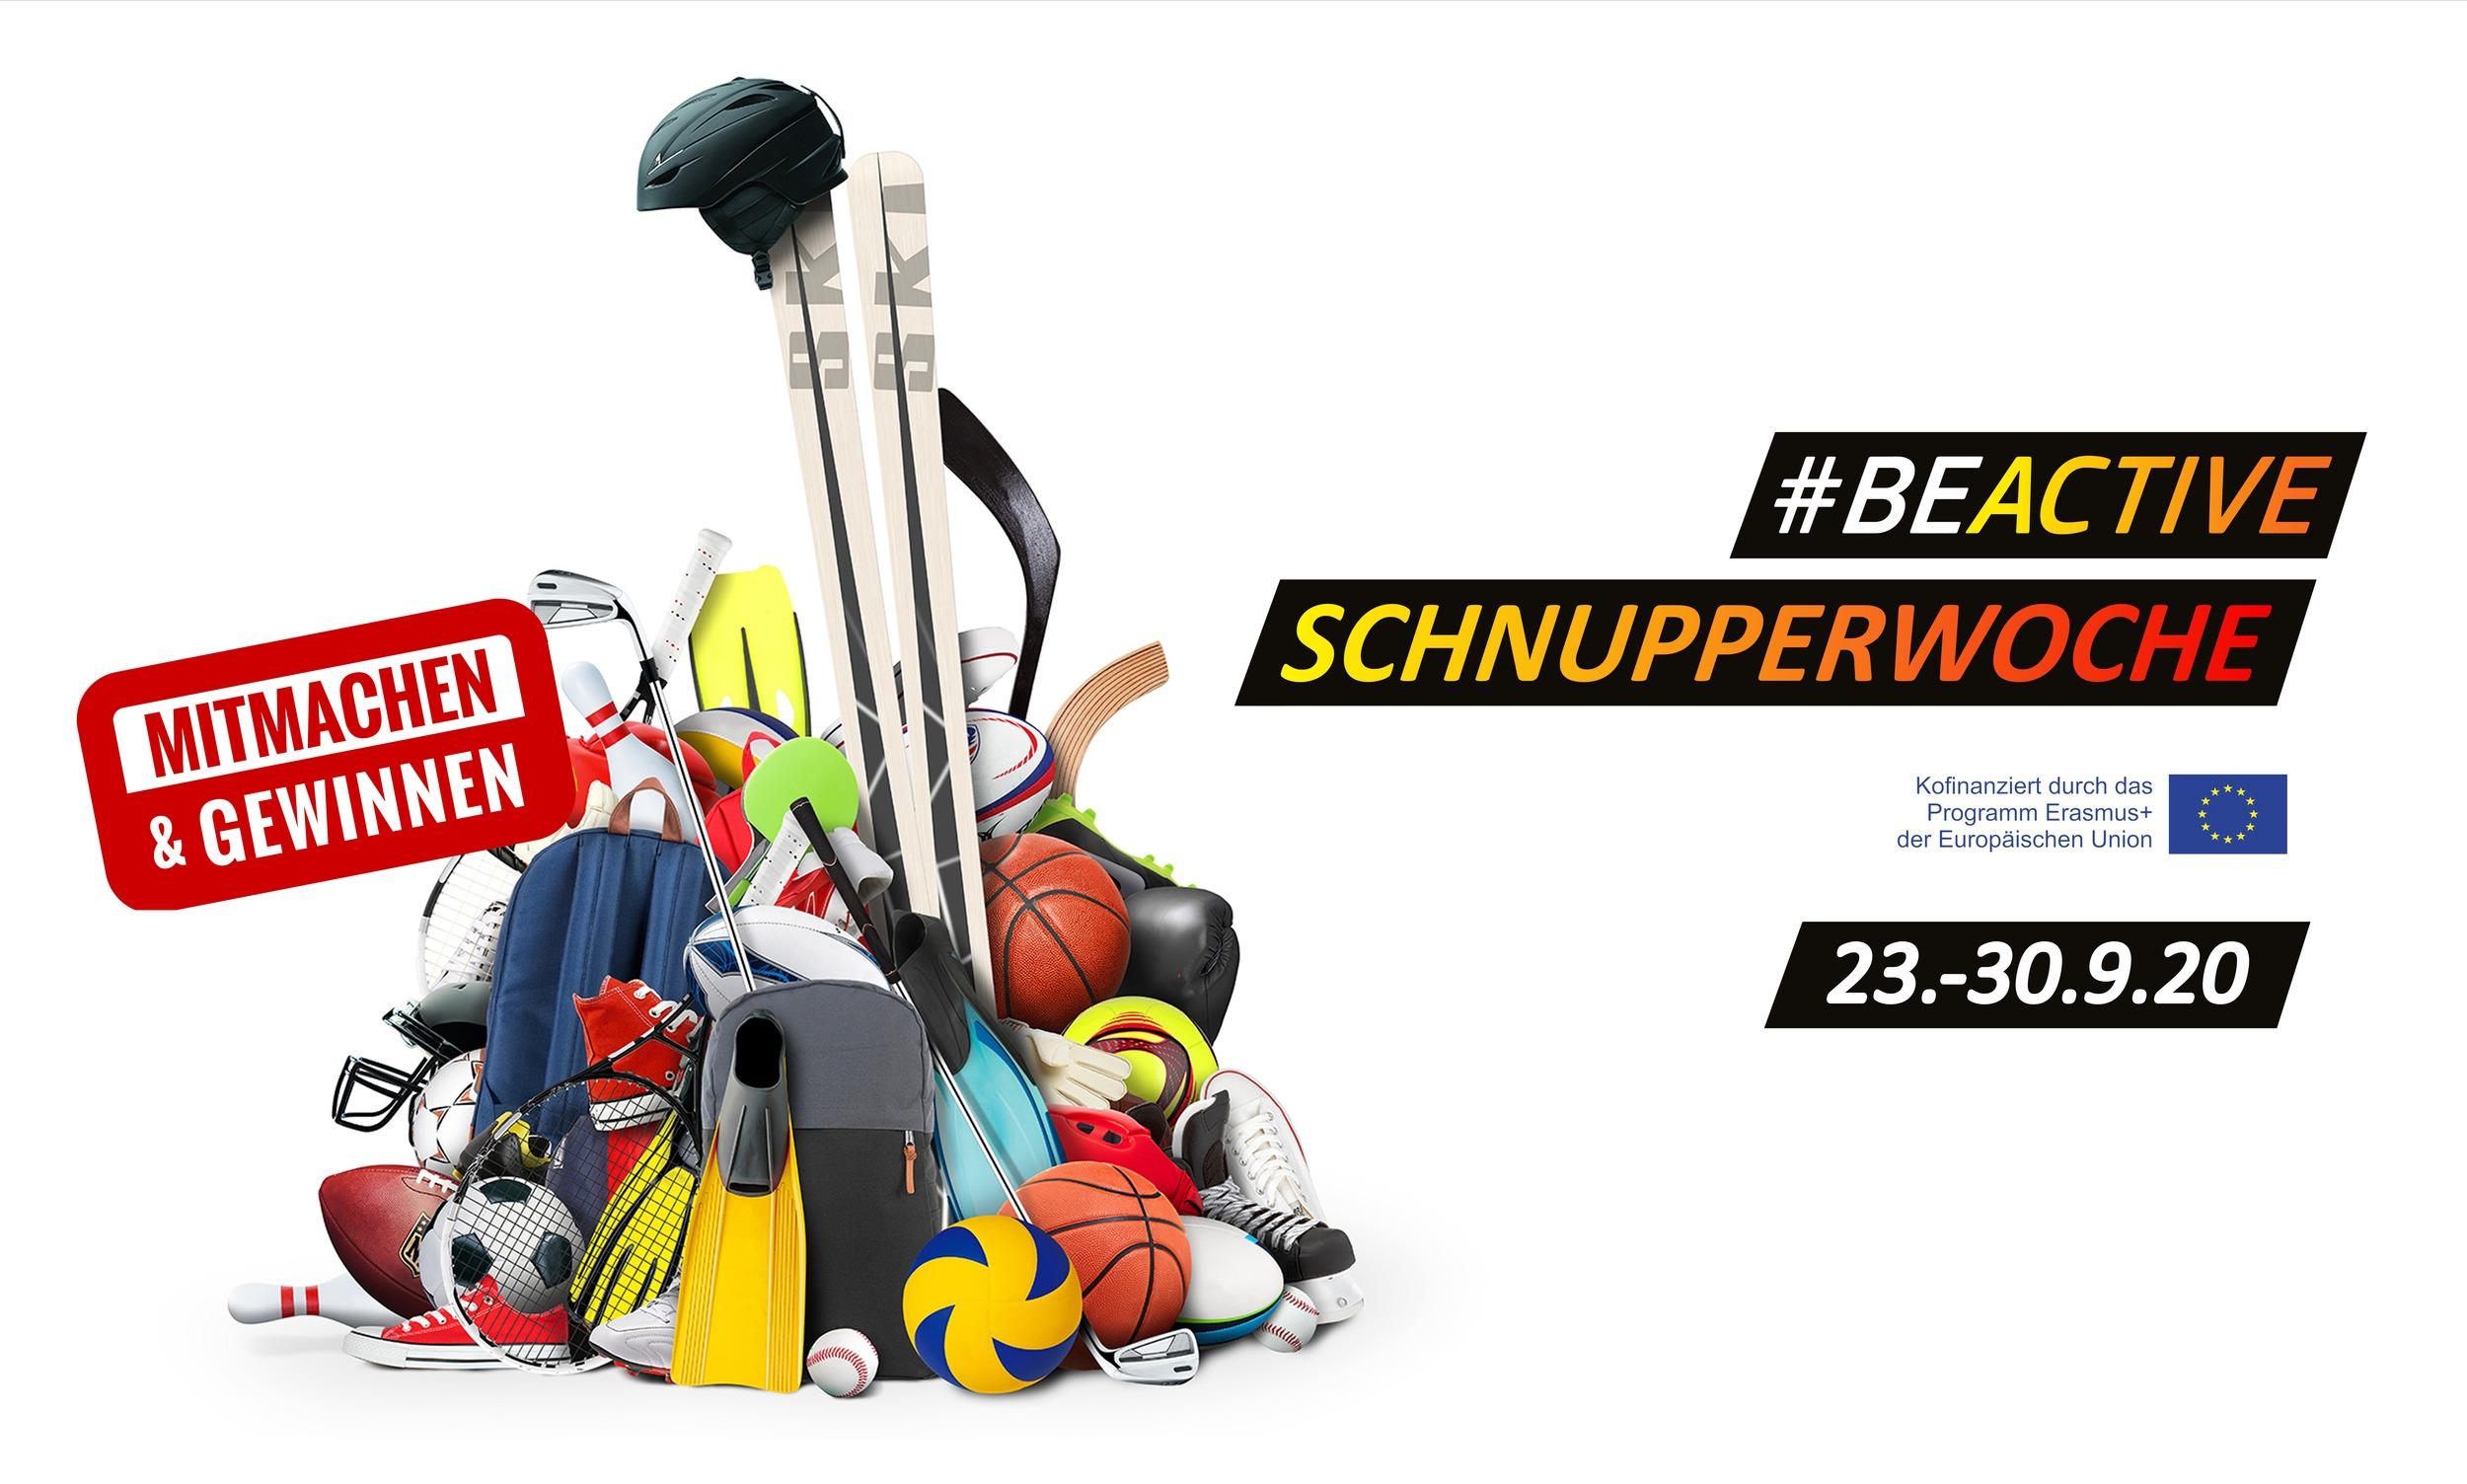 #BeActive Schnupperwoche Gewinner